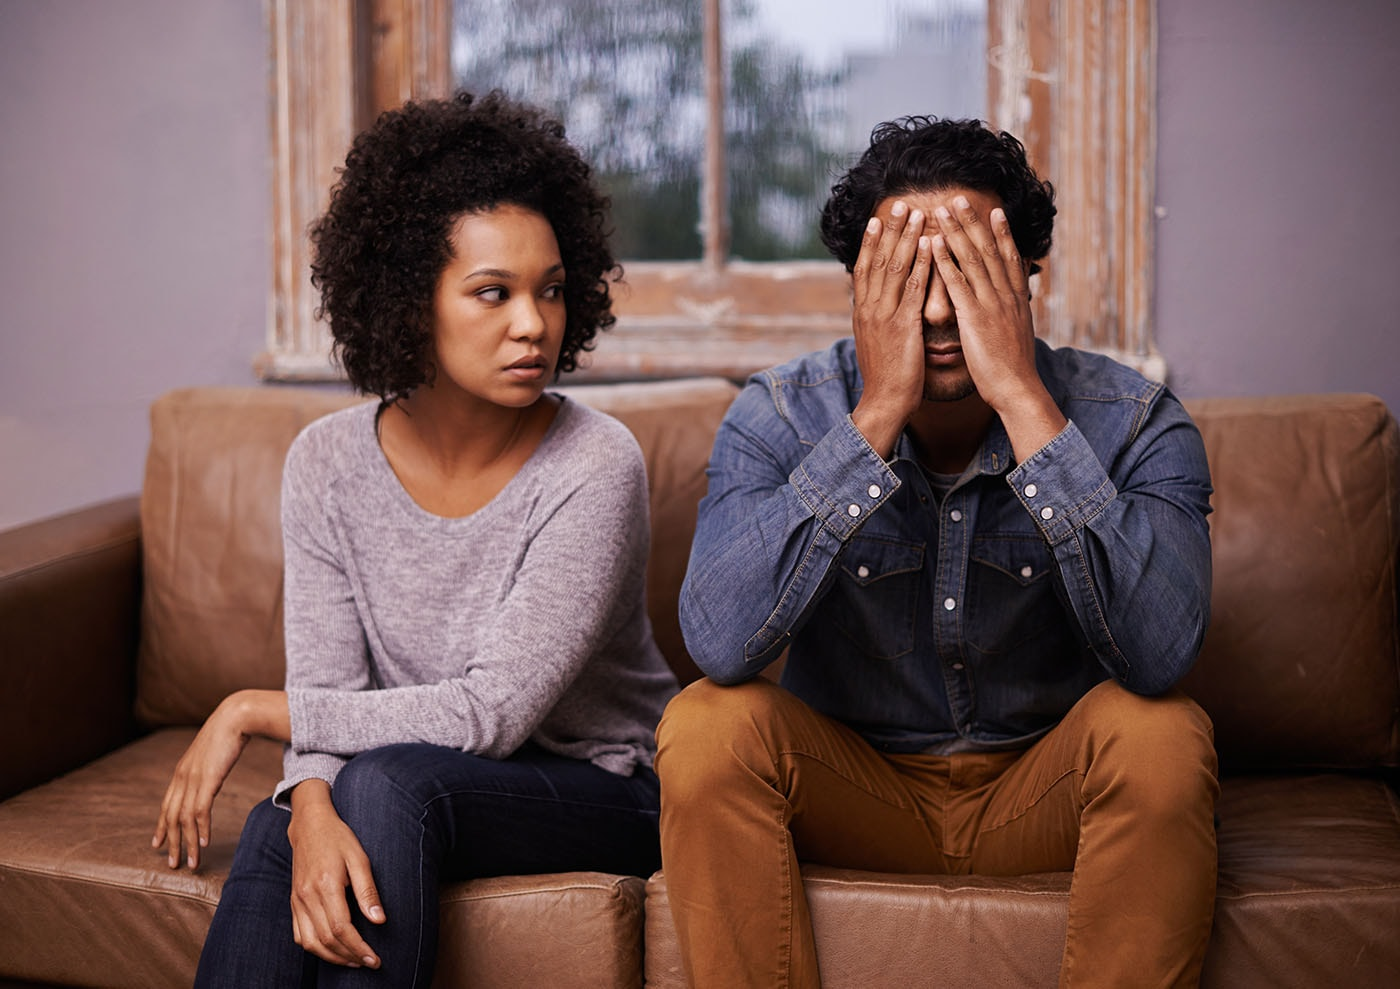 Top 7 Financial Tips When Facing Divorce article image.